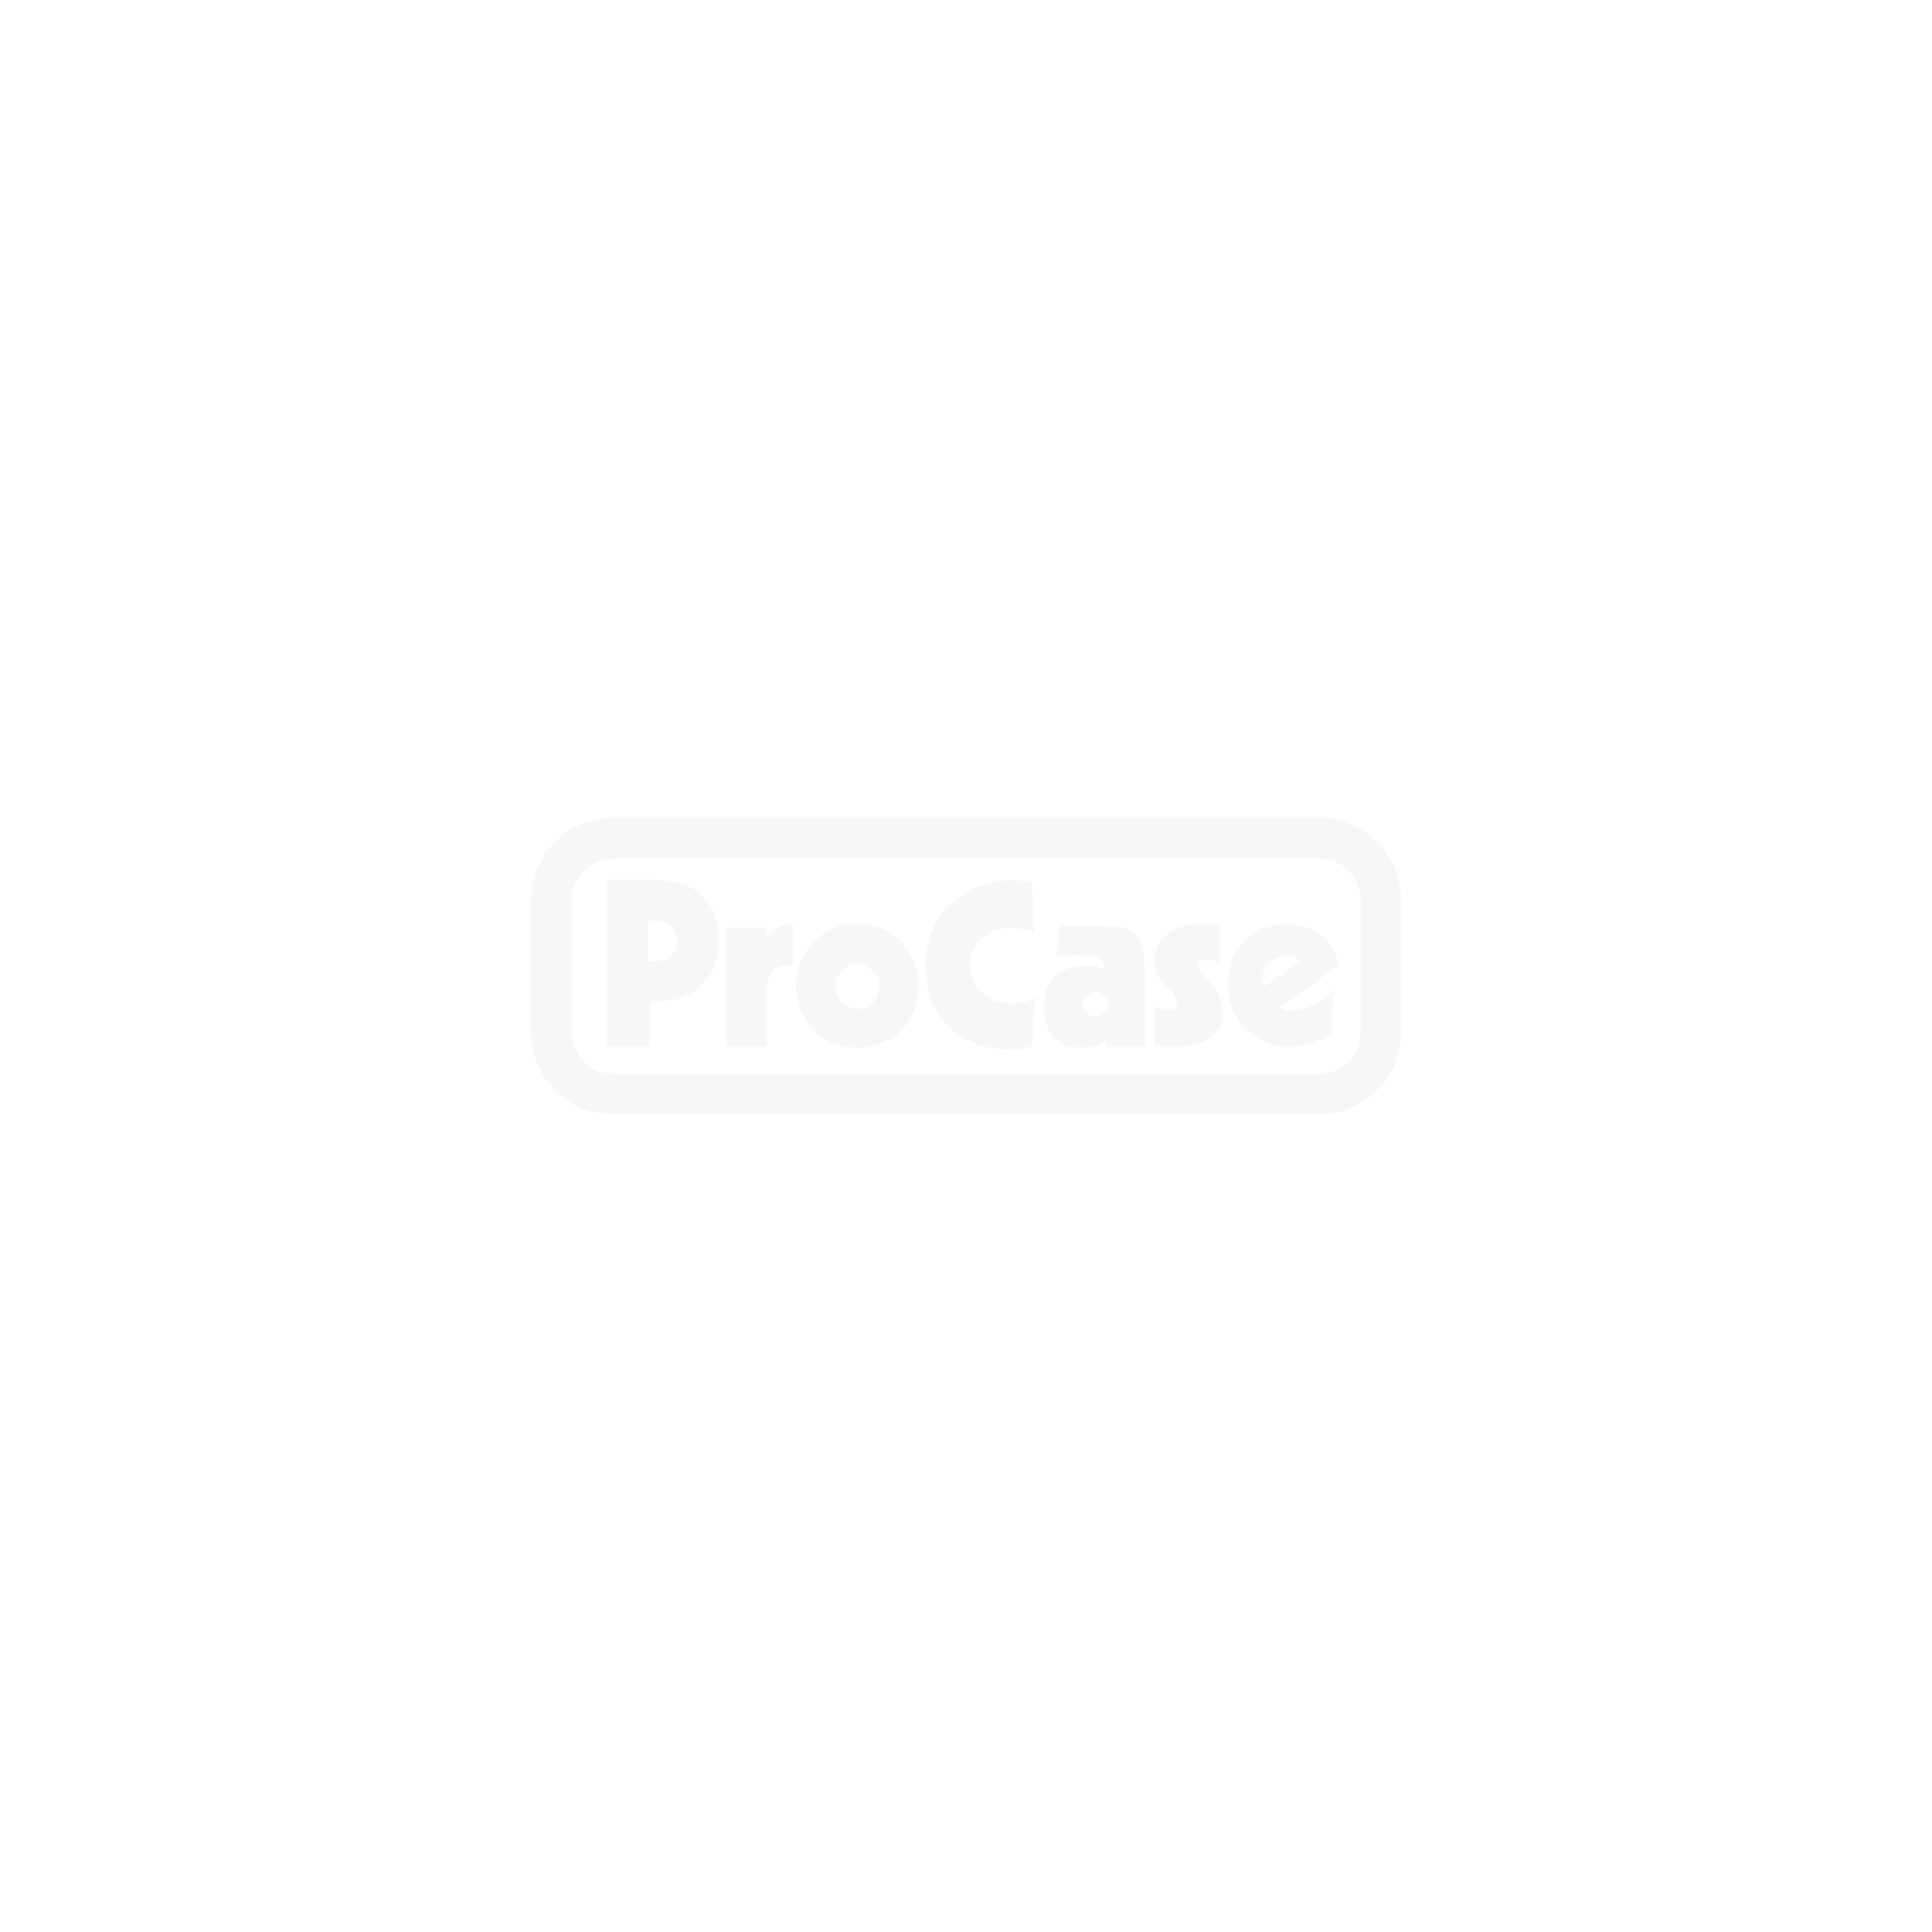 Transporkoffer für Sanyo PLC-XU78 2